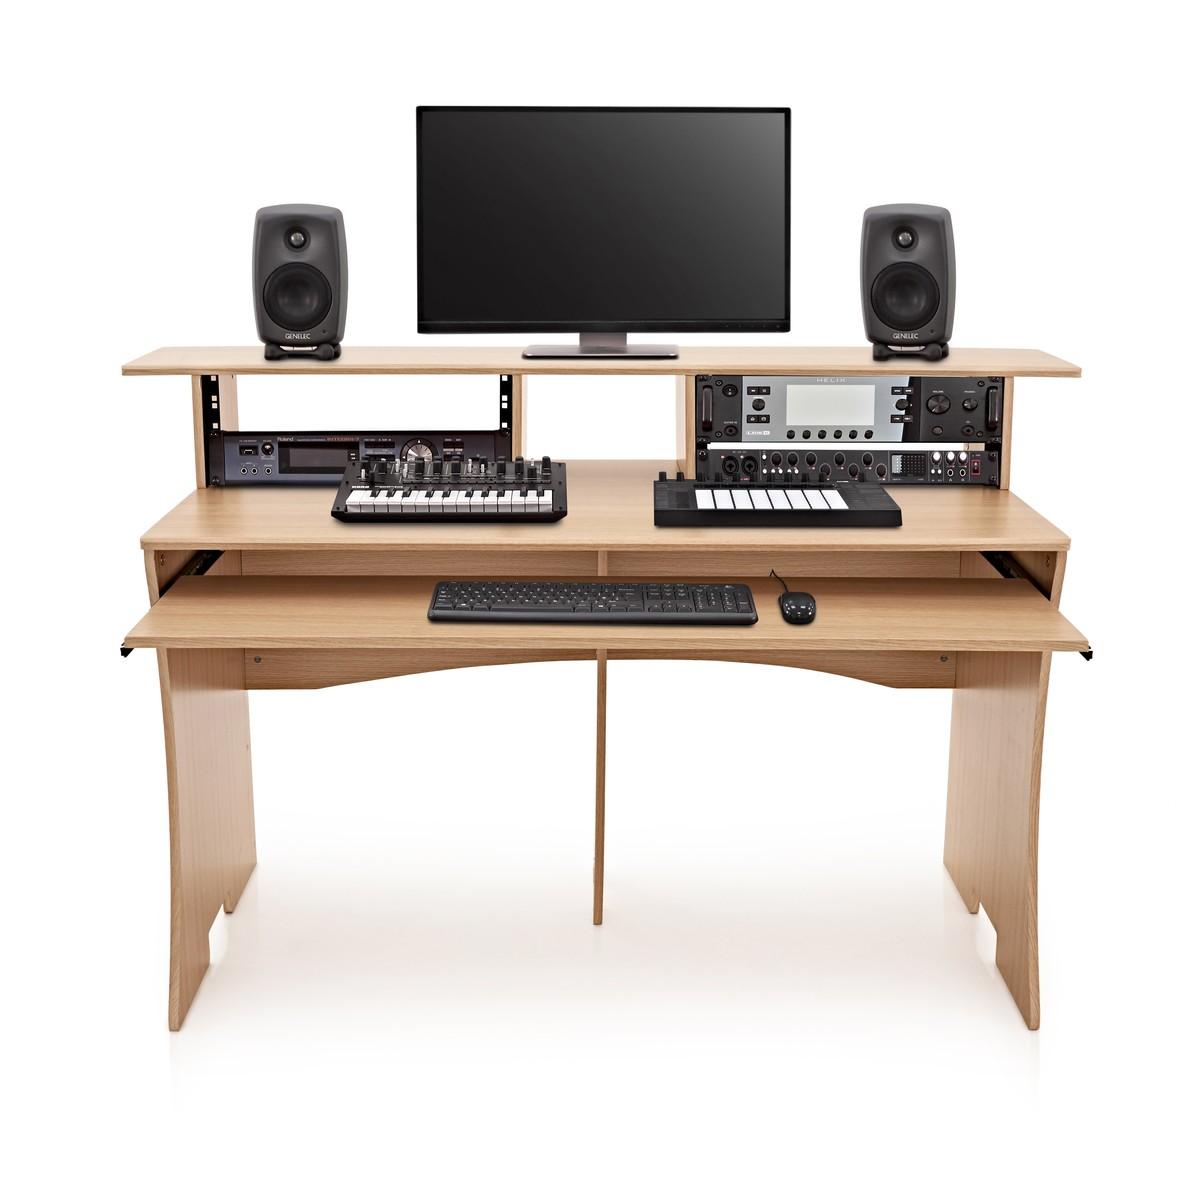 Audio Studio Desk : 3 tier pro audio studio desk by gear4music 8u natural at gear4music ~ Vivirlamusica.com Haus und Dekorationen